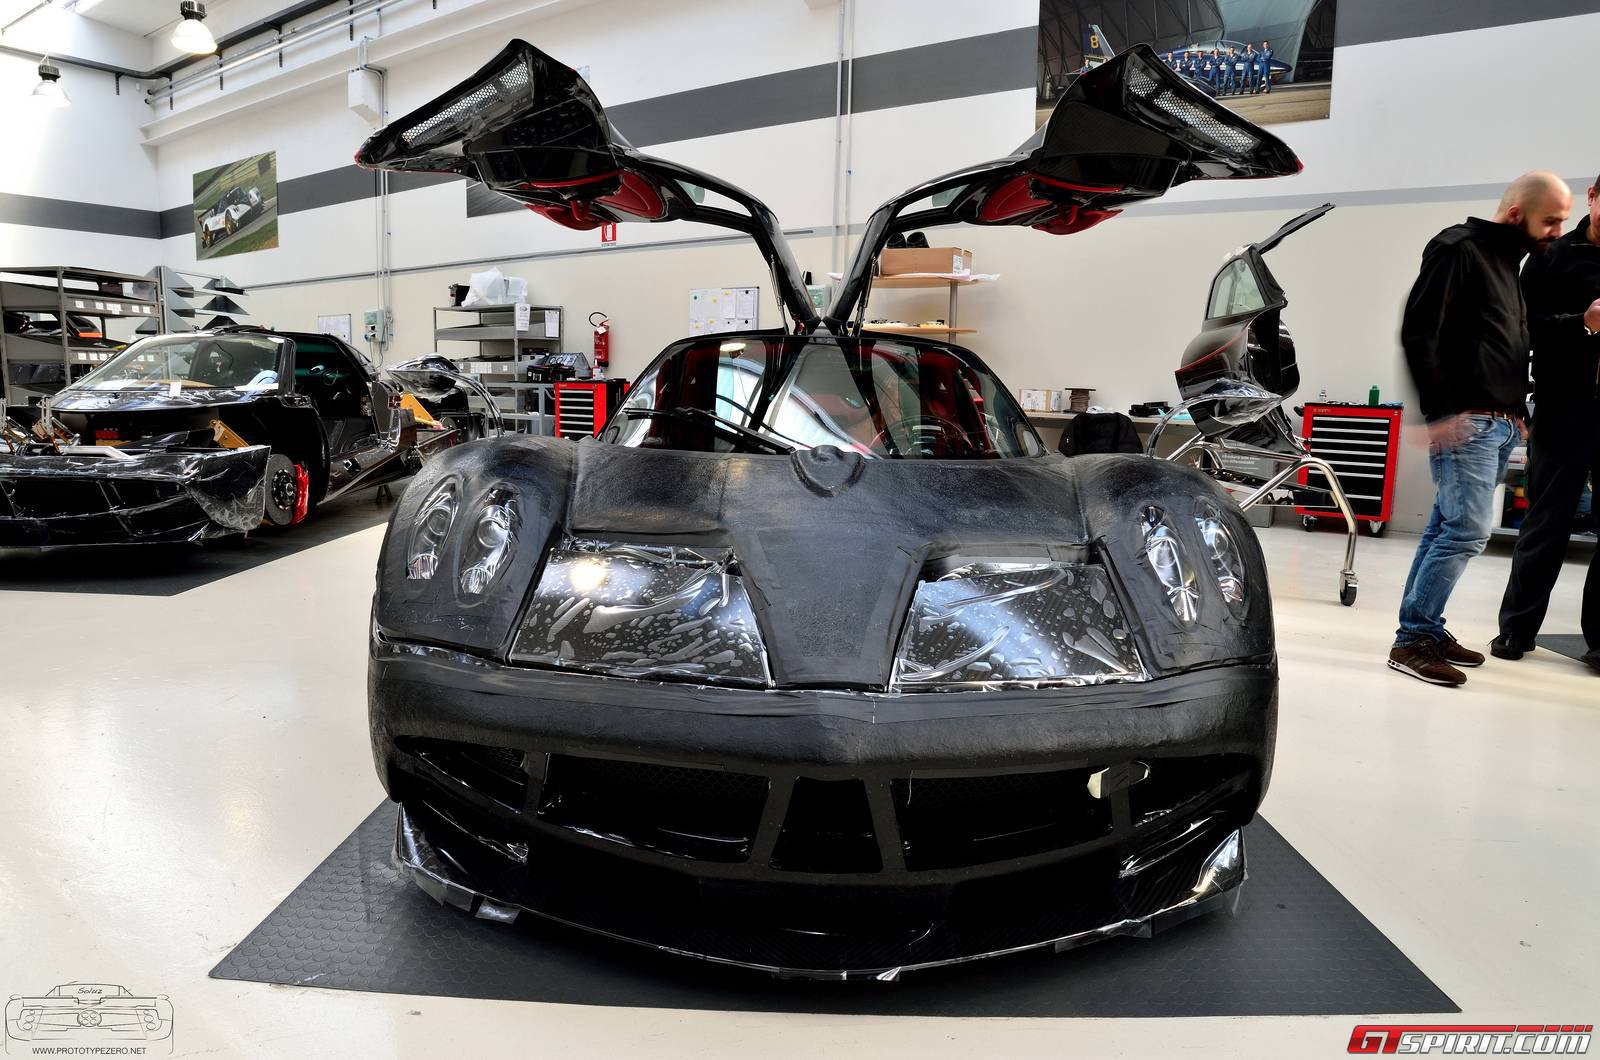 factory visit: pagani automobili headquarters in modena, italy